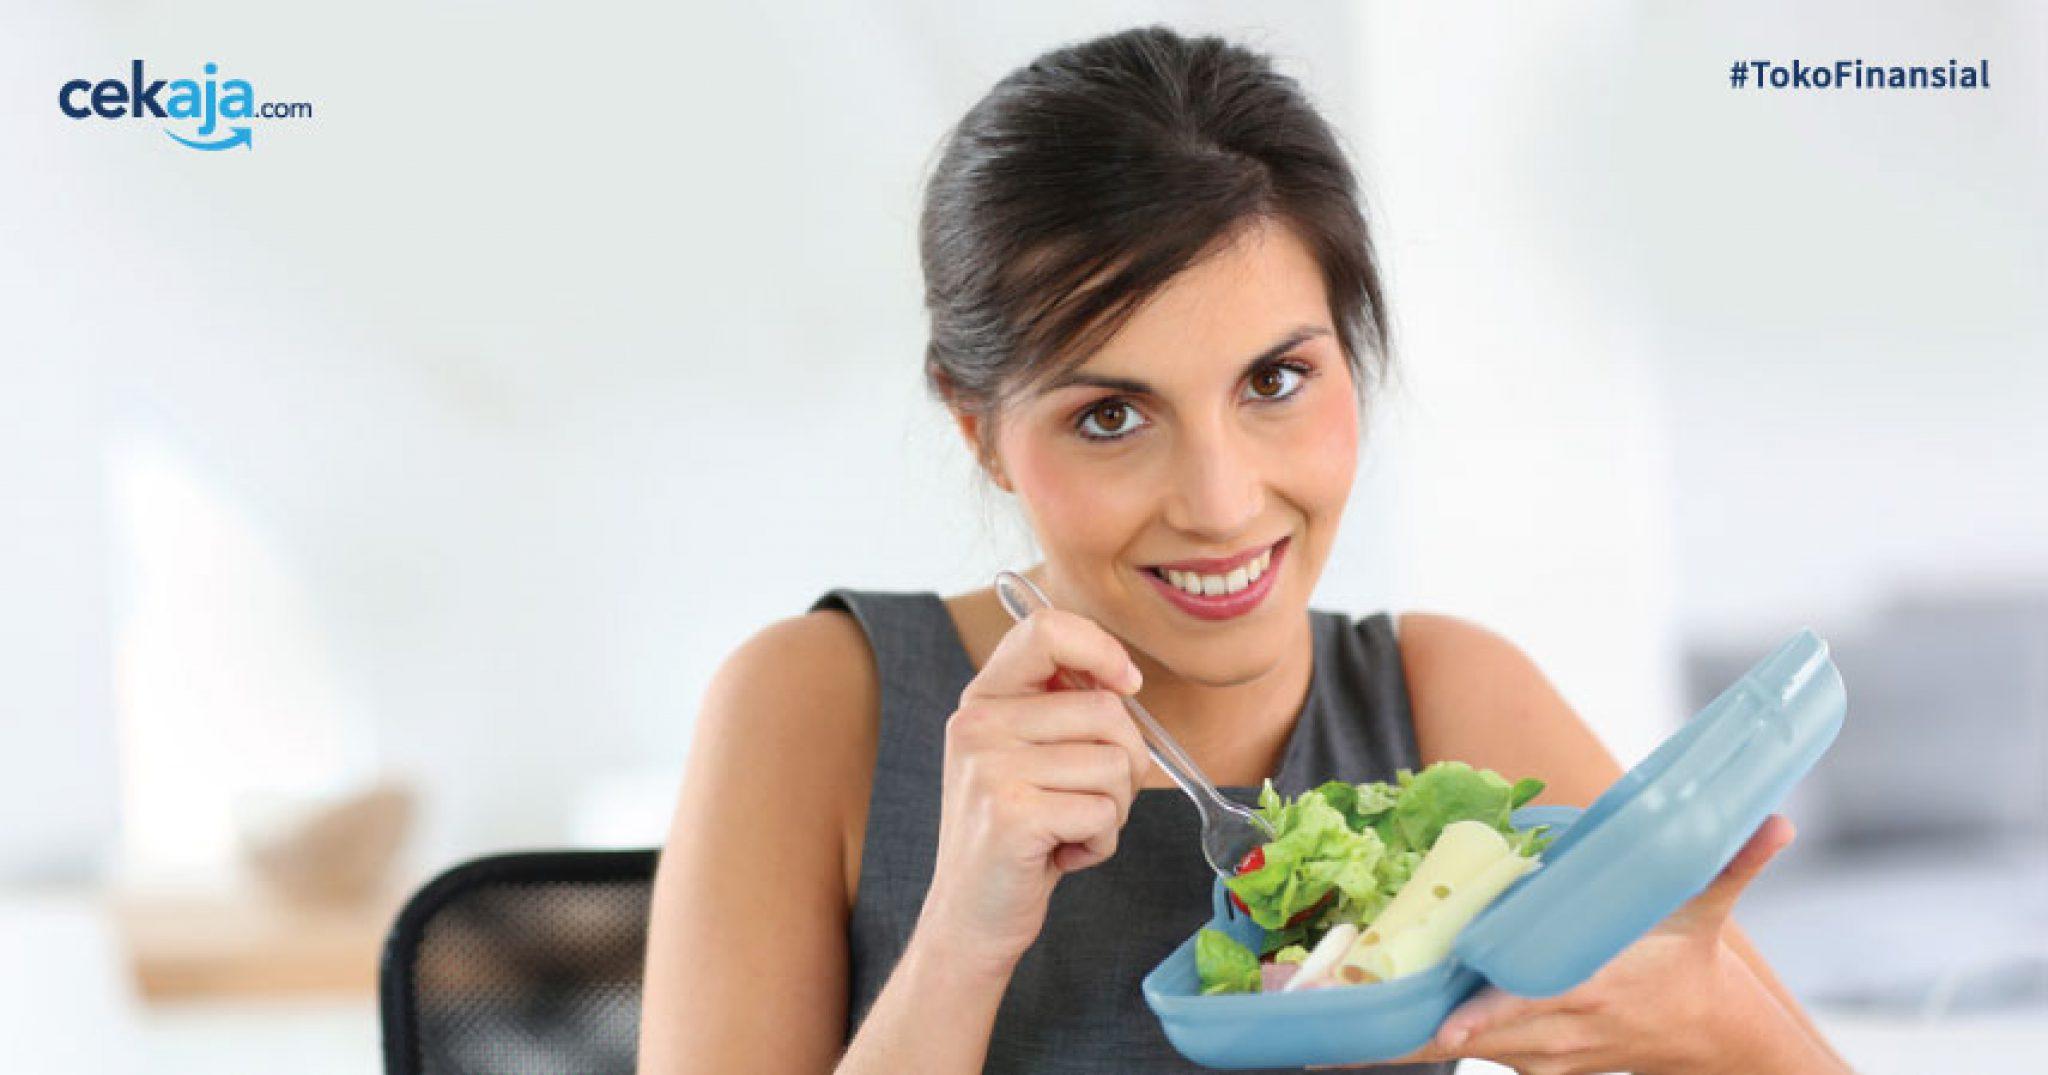 makanan sehat - CekAja.com